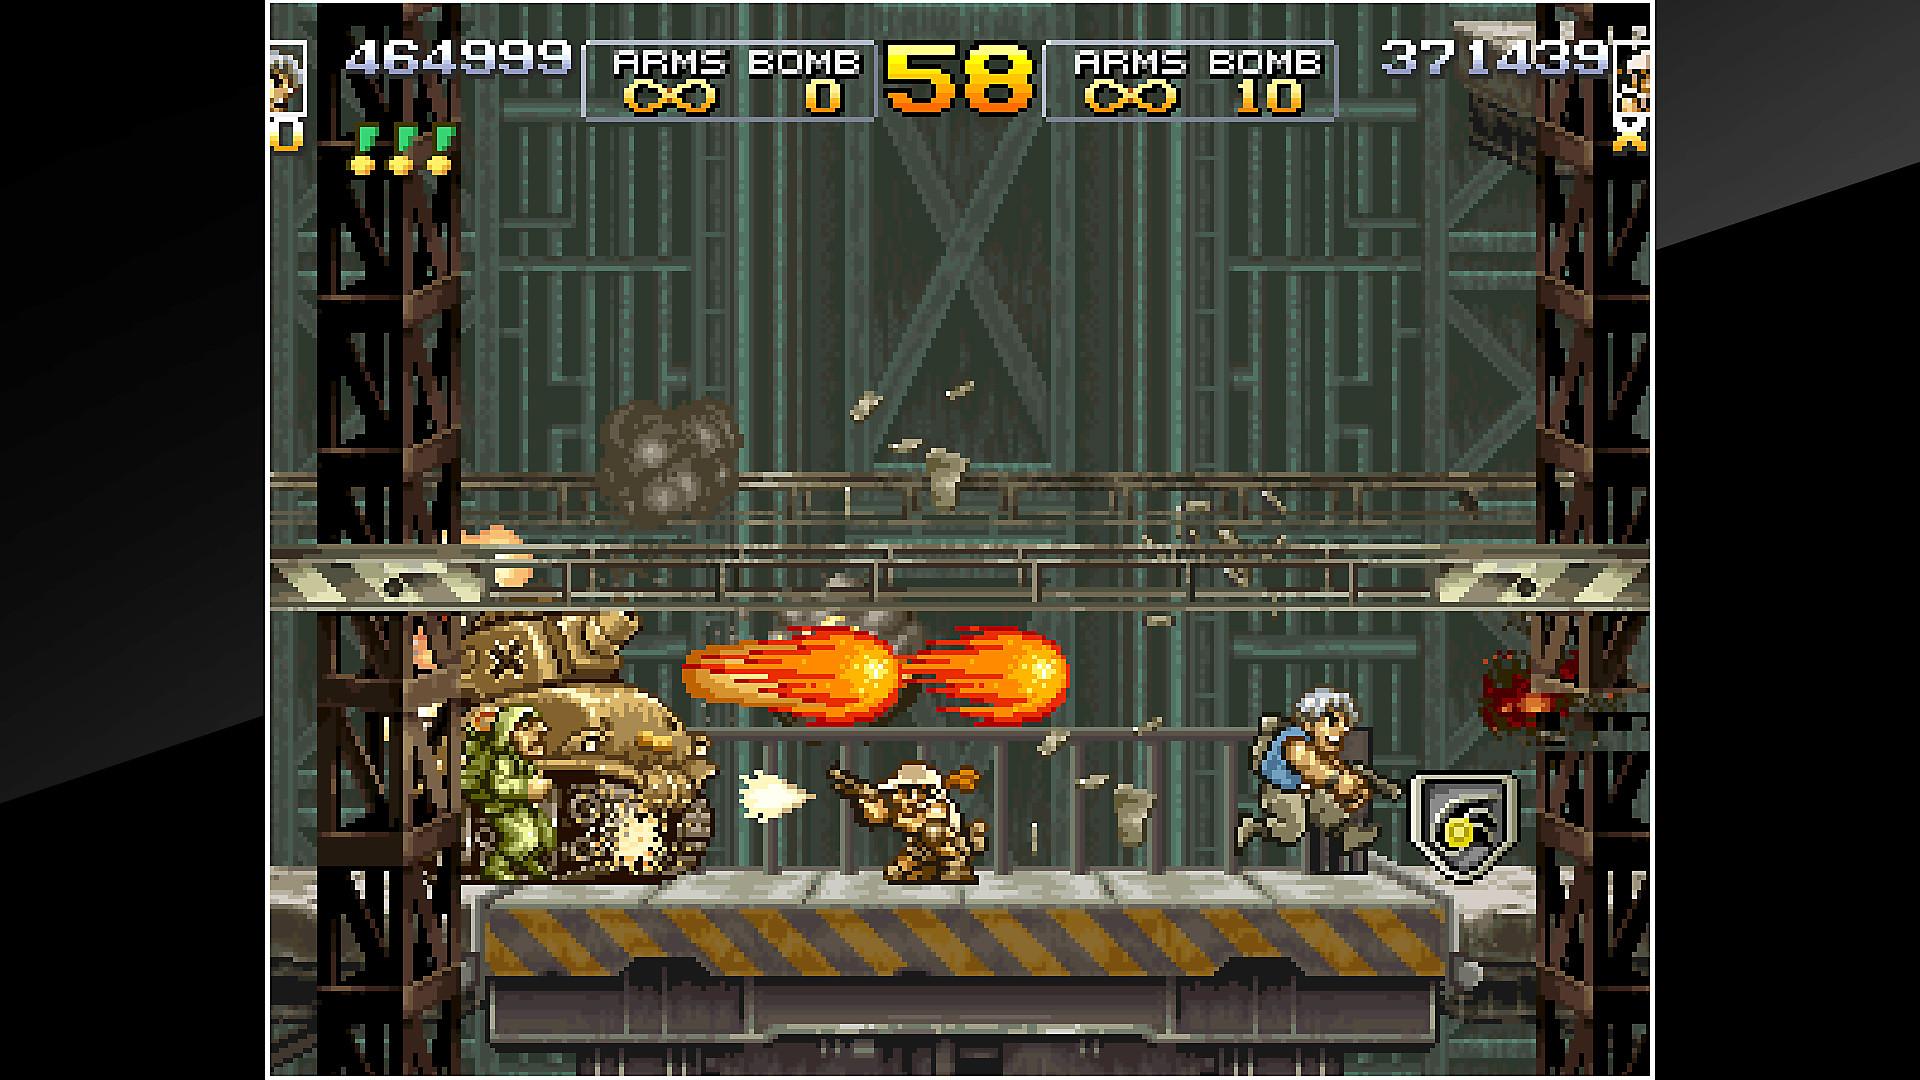 metal slug 4 game free download for pc